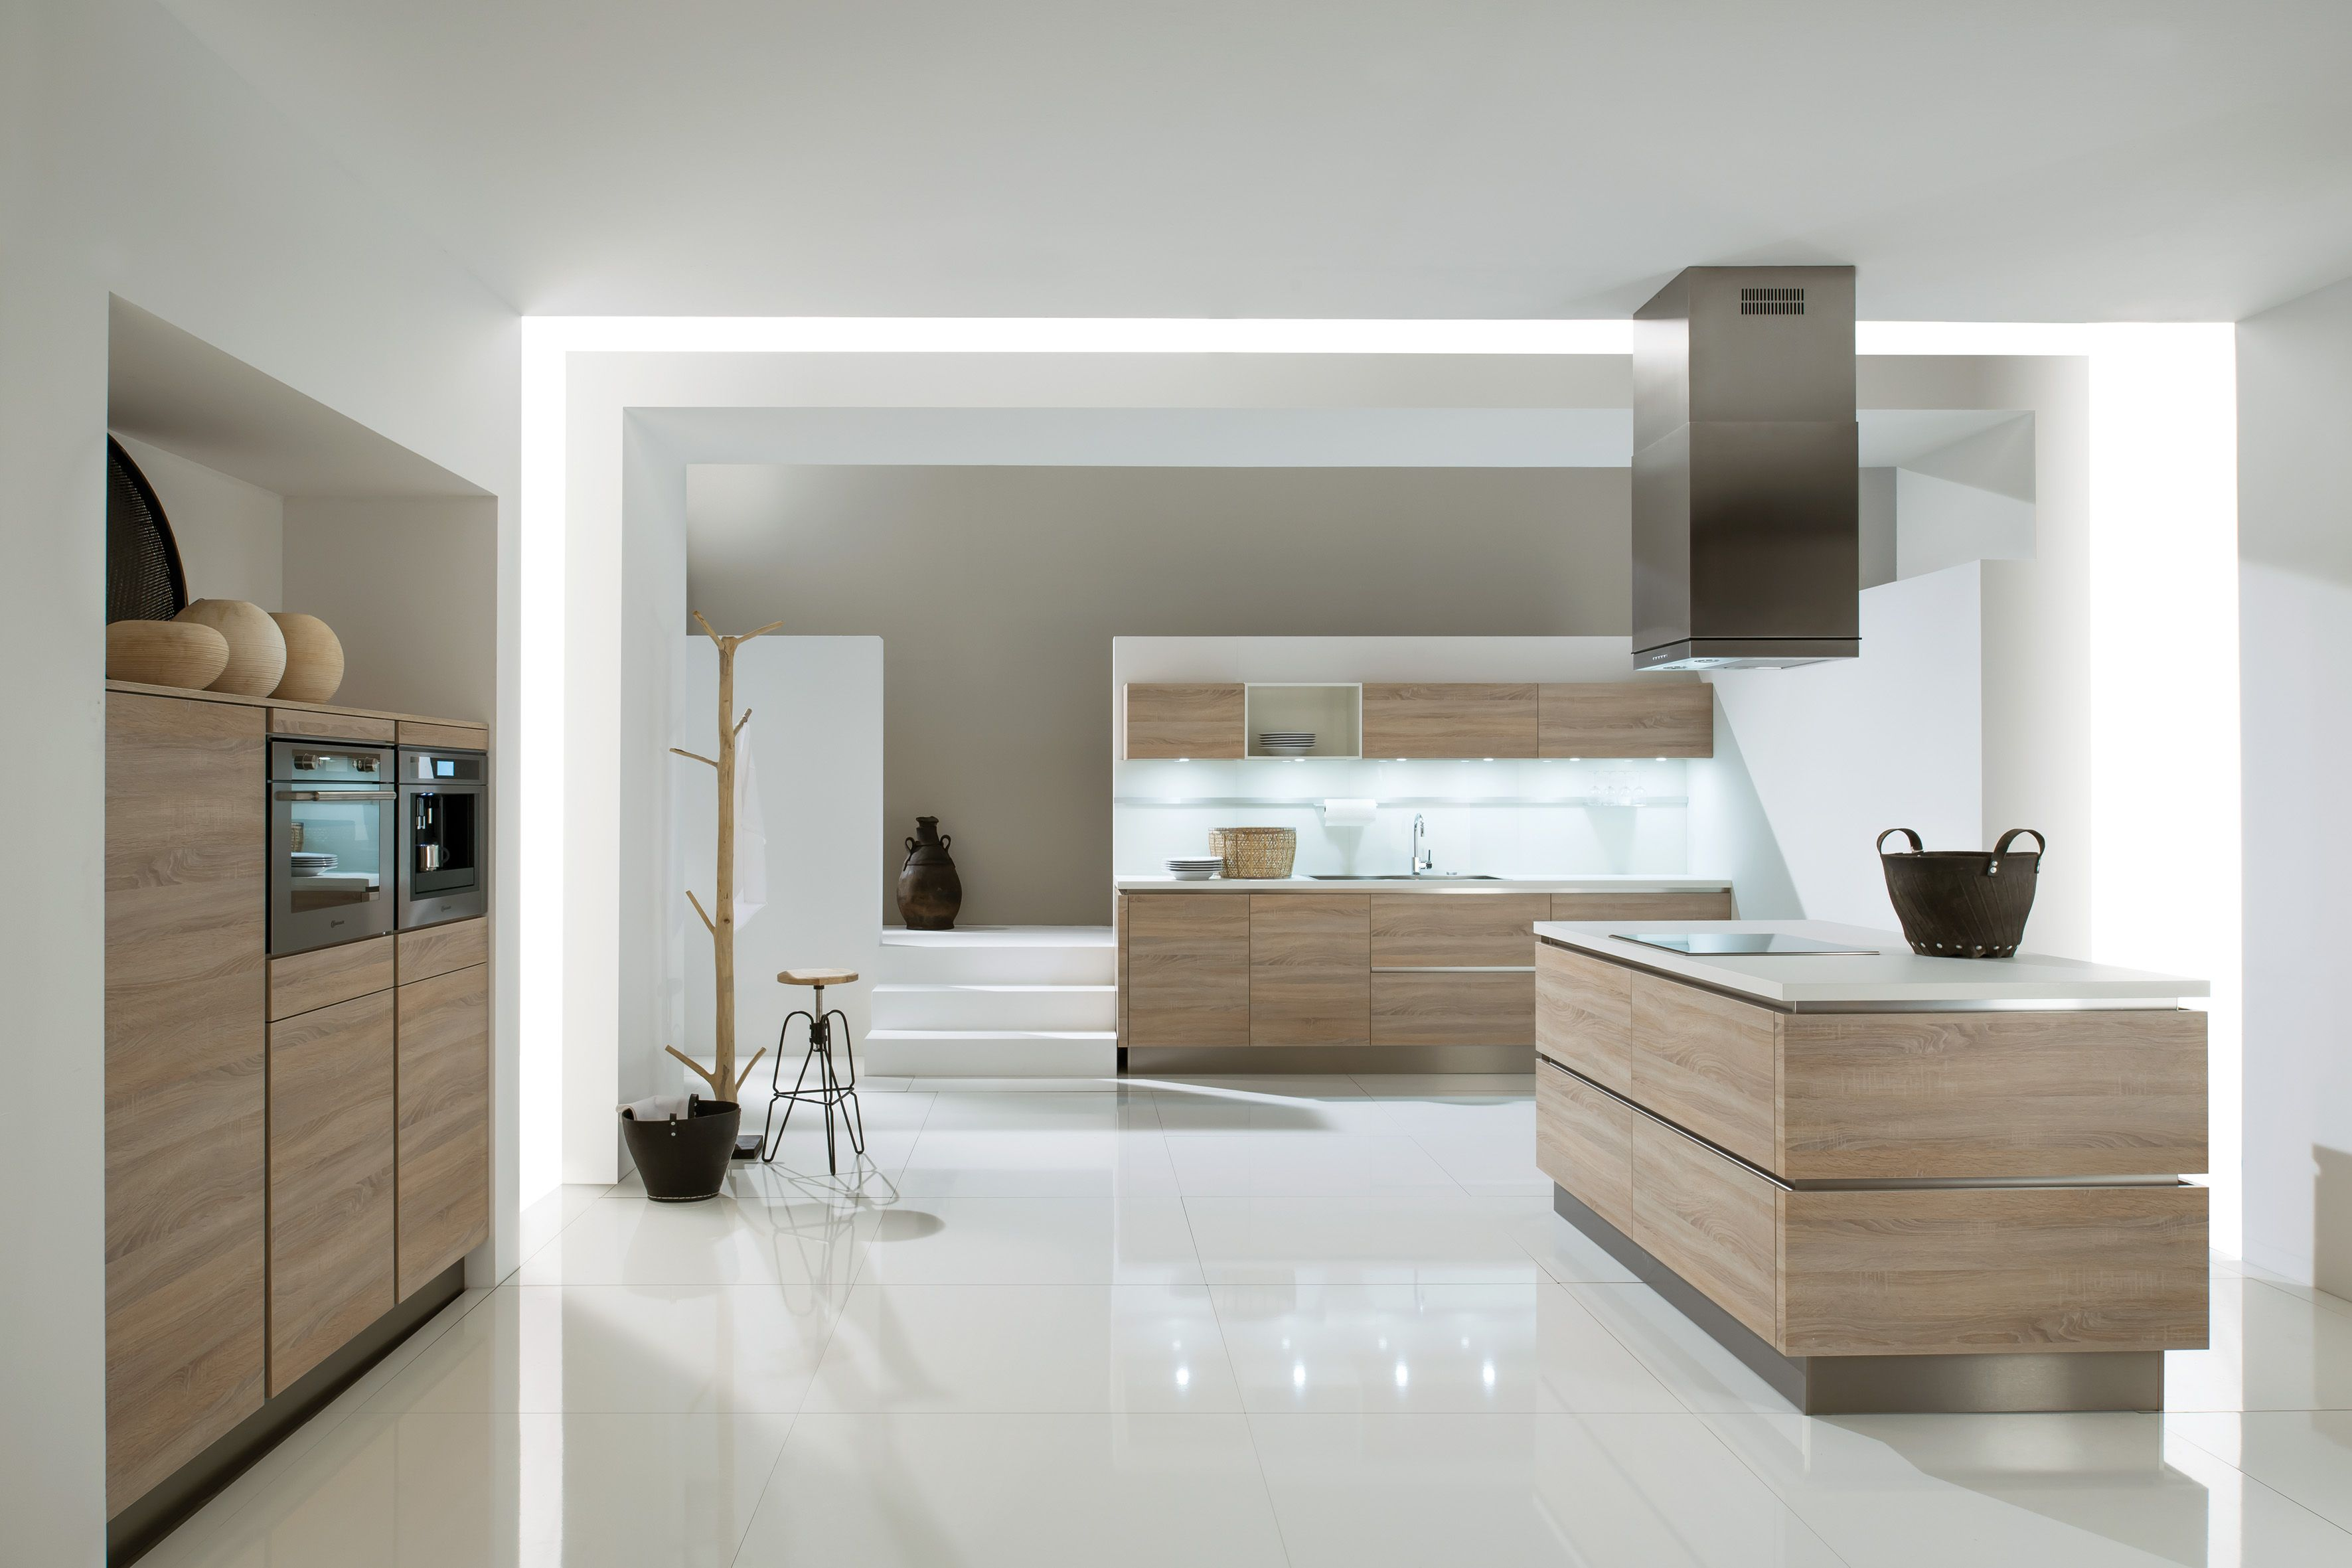 witte keuken amerikaanse koelkast - Google zoeken   Keuken ...